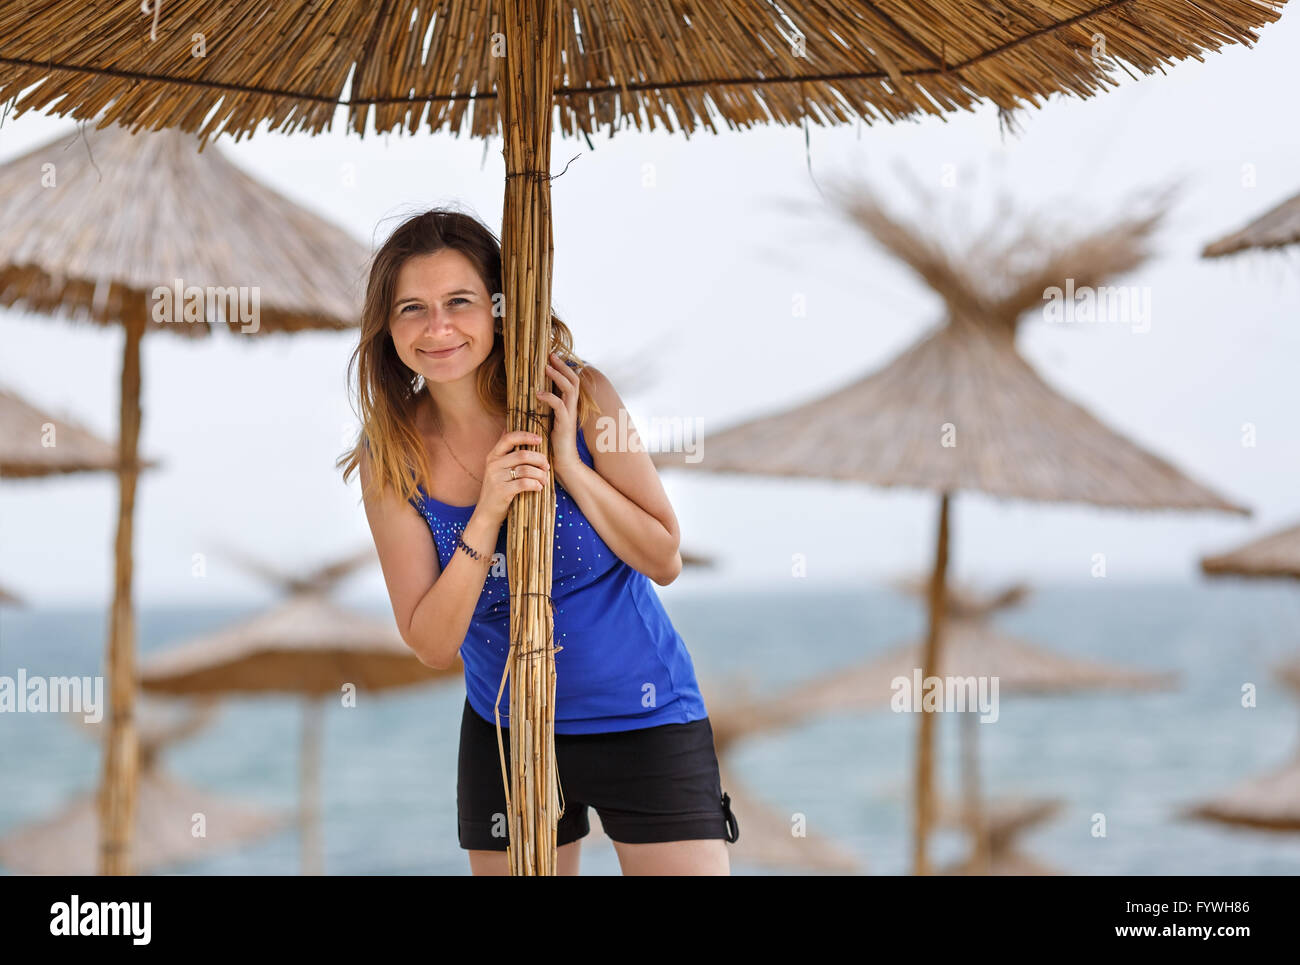 Woman and straw umbrella - Stock Image